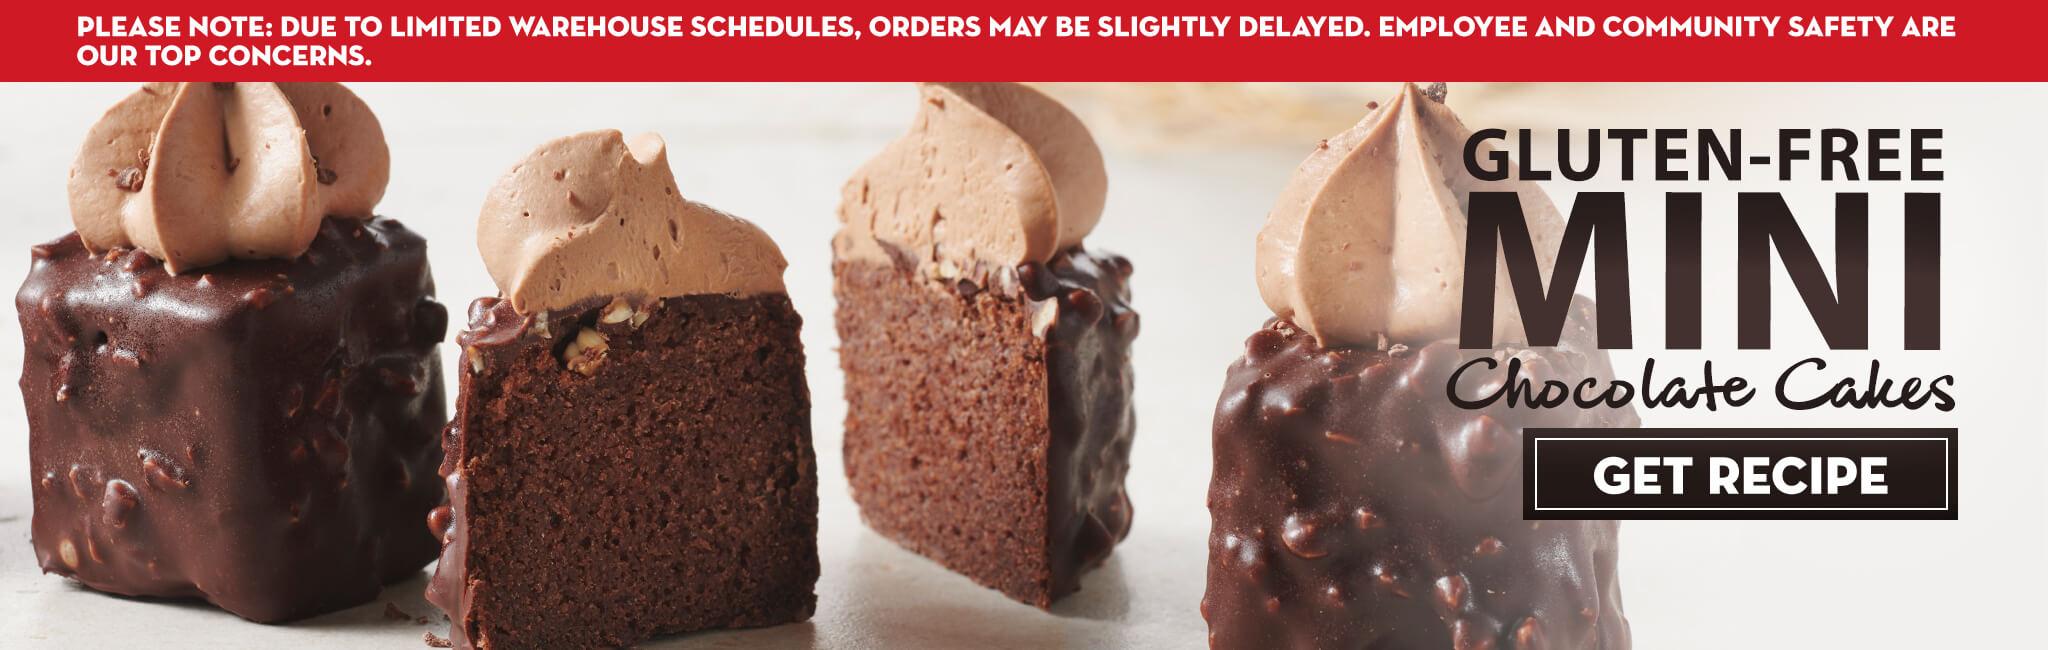 MINI GLUTEN-FREE CHOCOLATE CAKE RECIPE